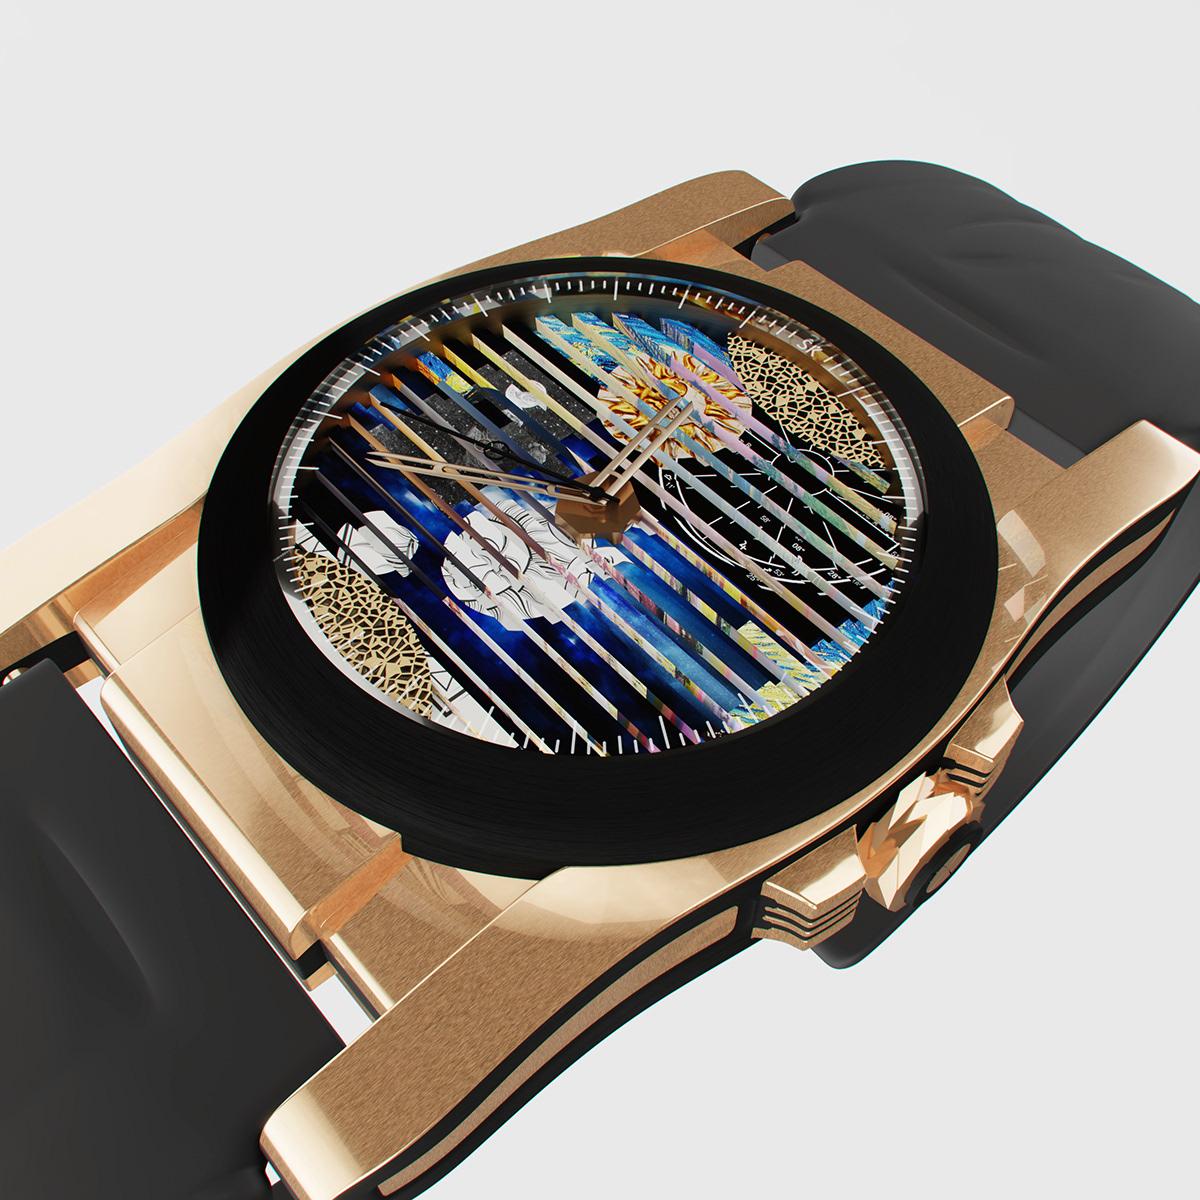 clock design swiss krasowski clock face Roll industrial design  luxury product Watches watches design